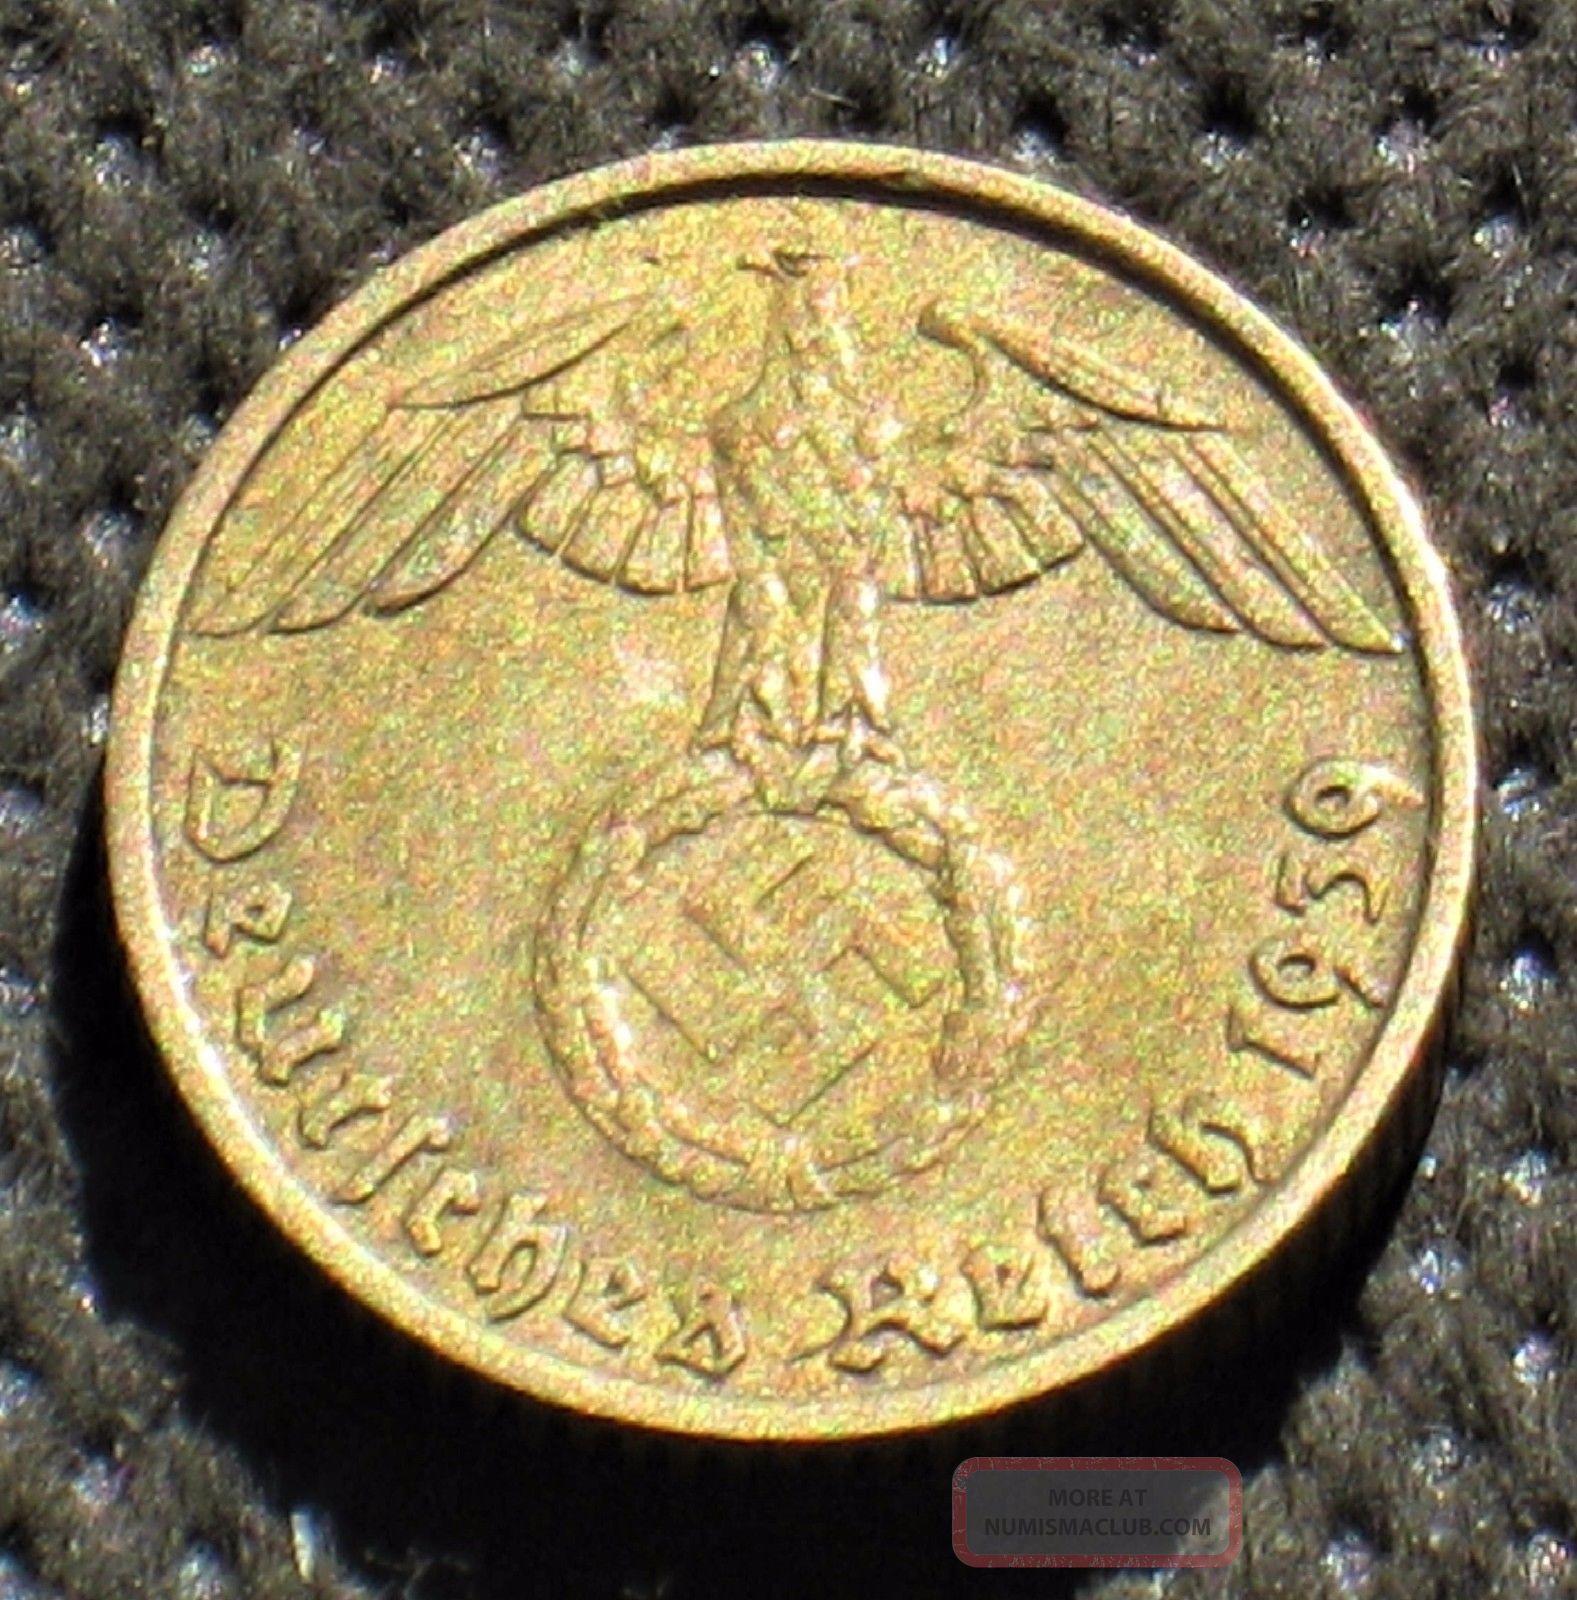 Old Coin Nazi Germany 5 Reichspfennig 1939 A Berlin W/ Swastika World War Ii (1) Germany photo